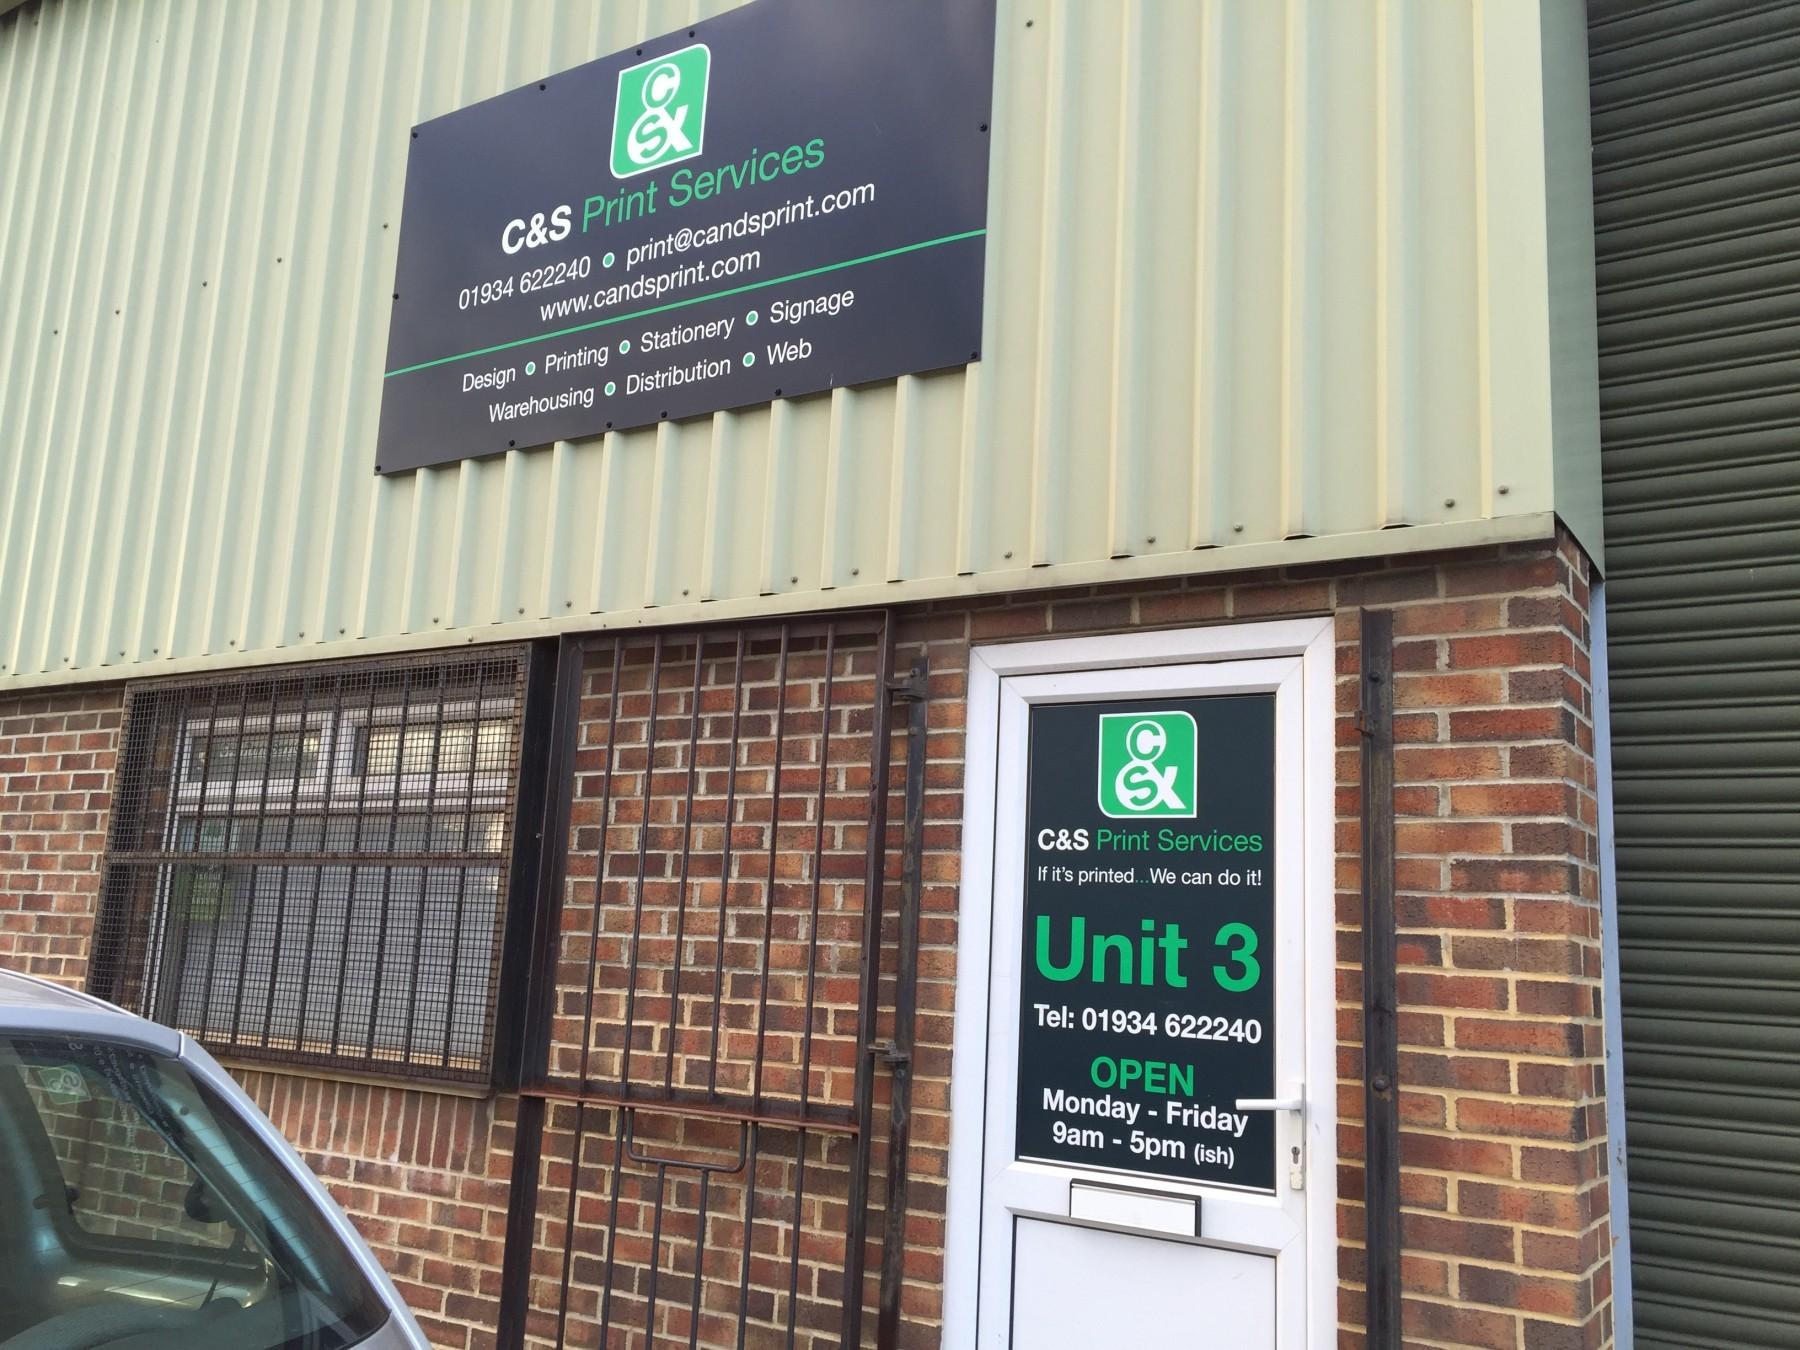 C&S Print Services